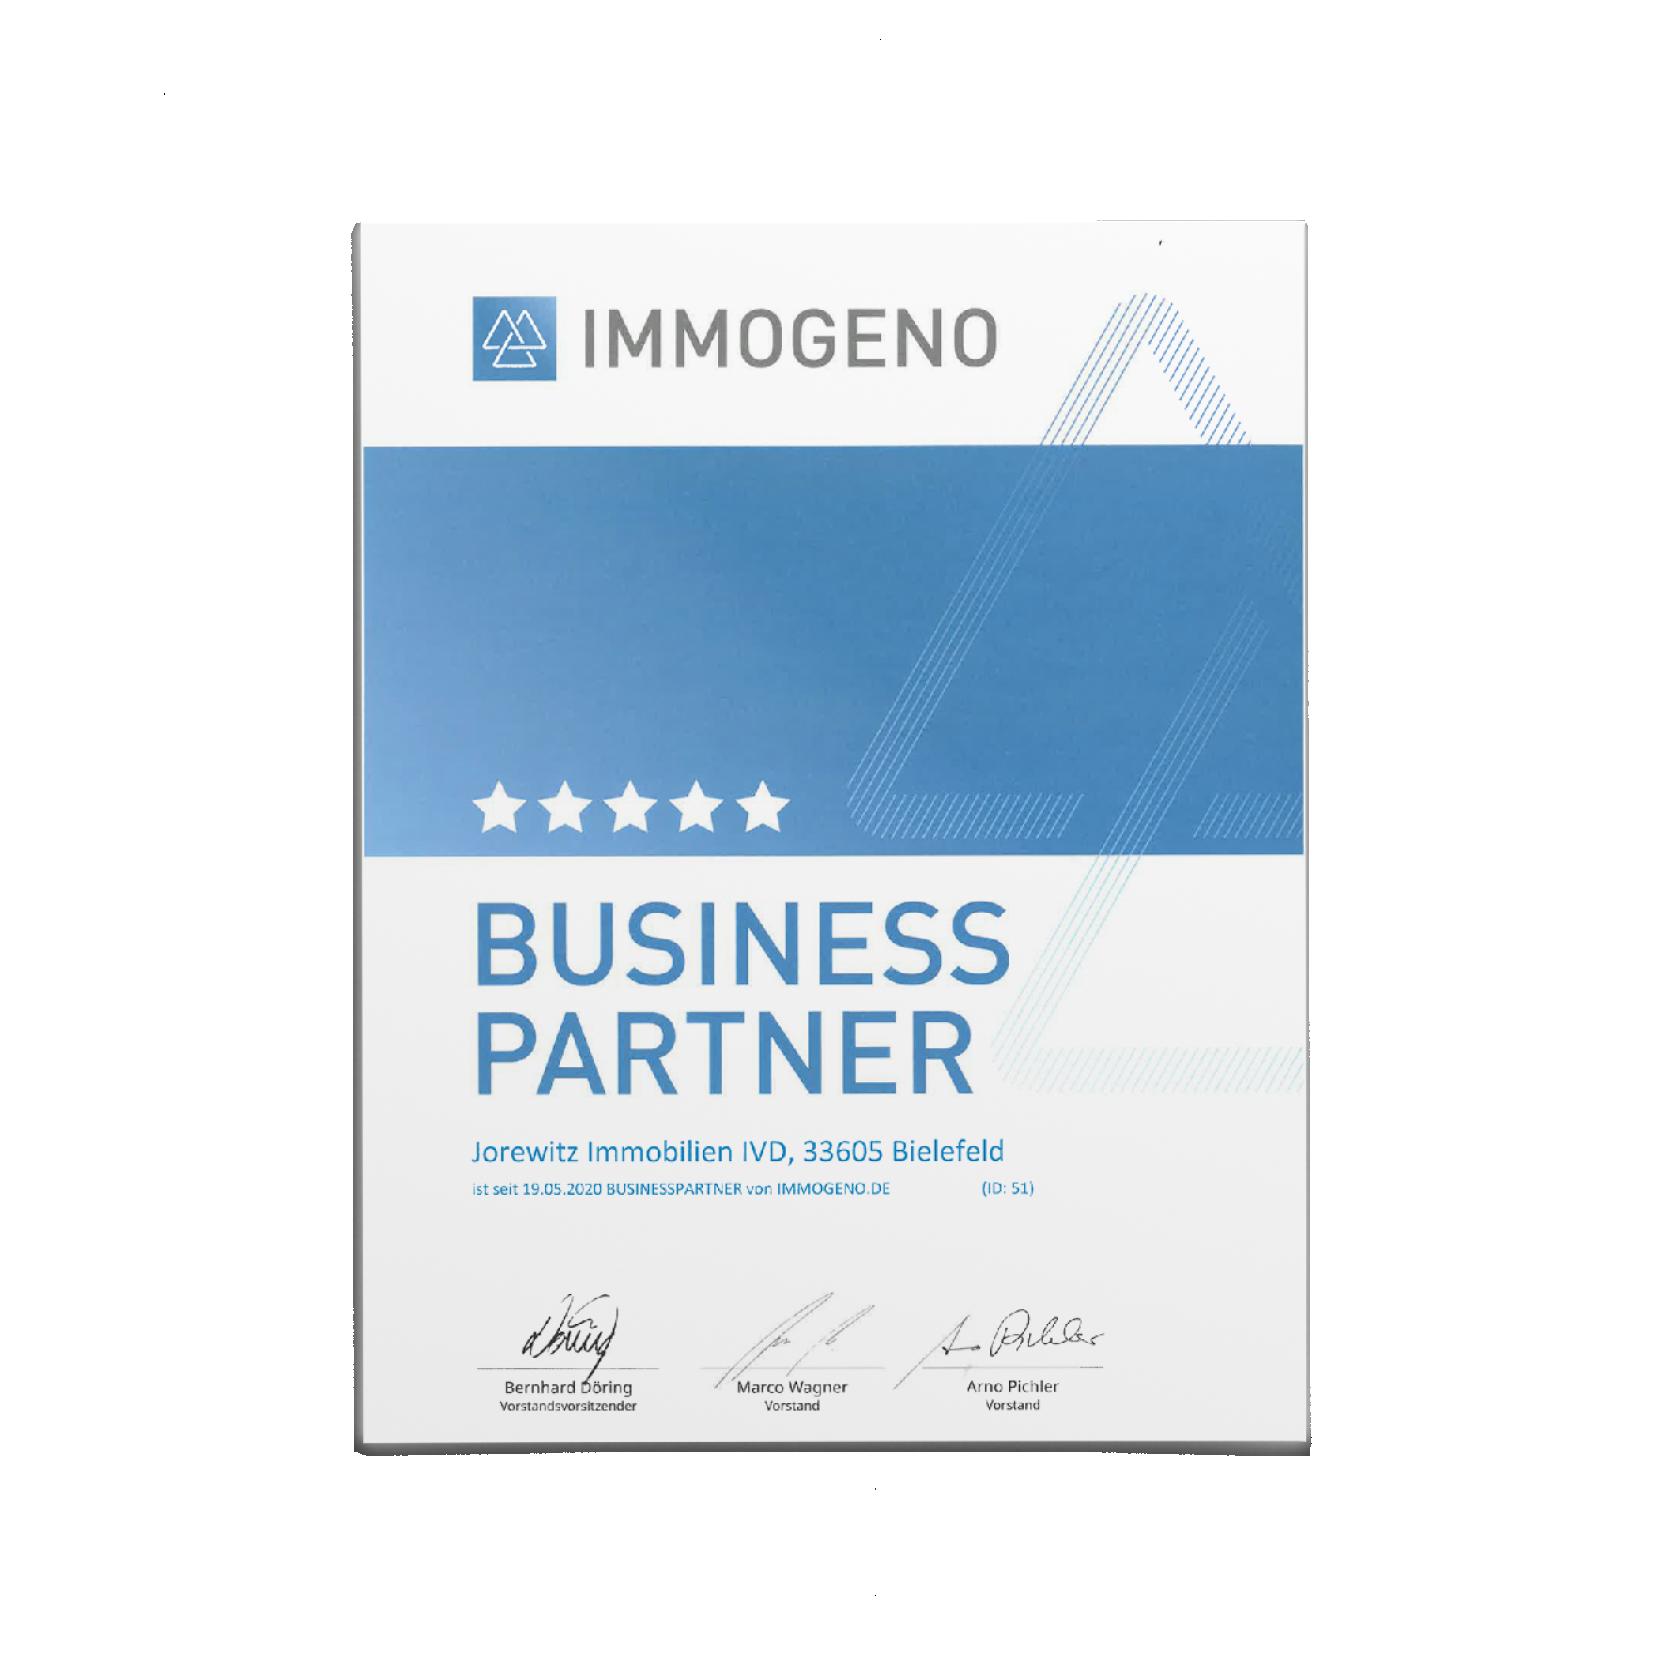 Immogeno_Businesspartner